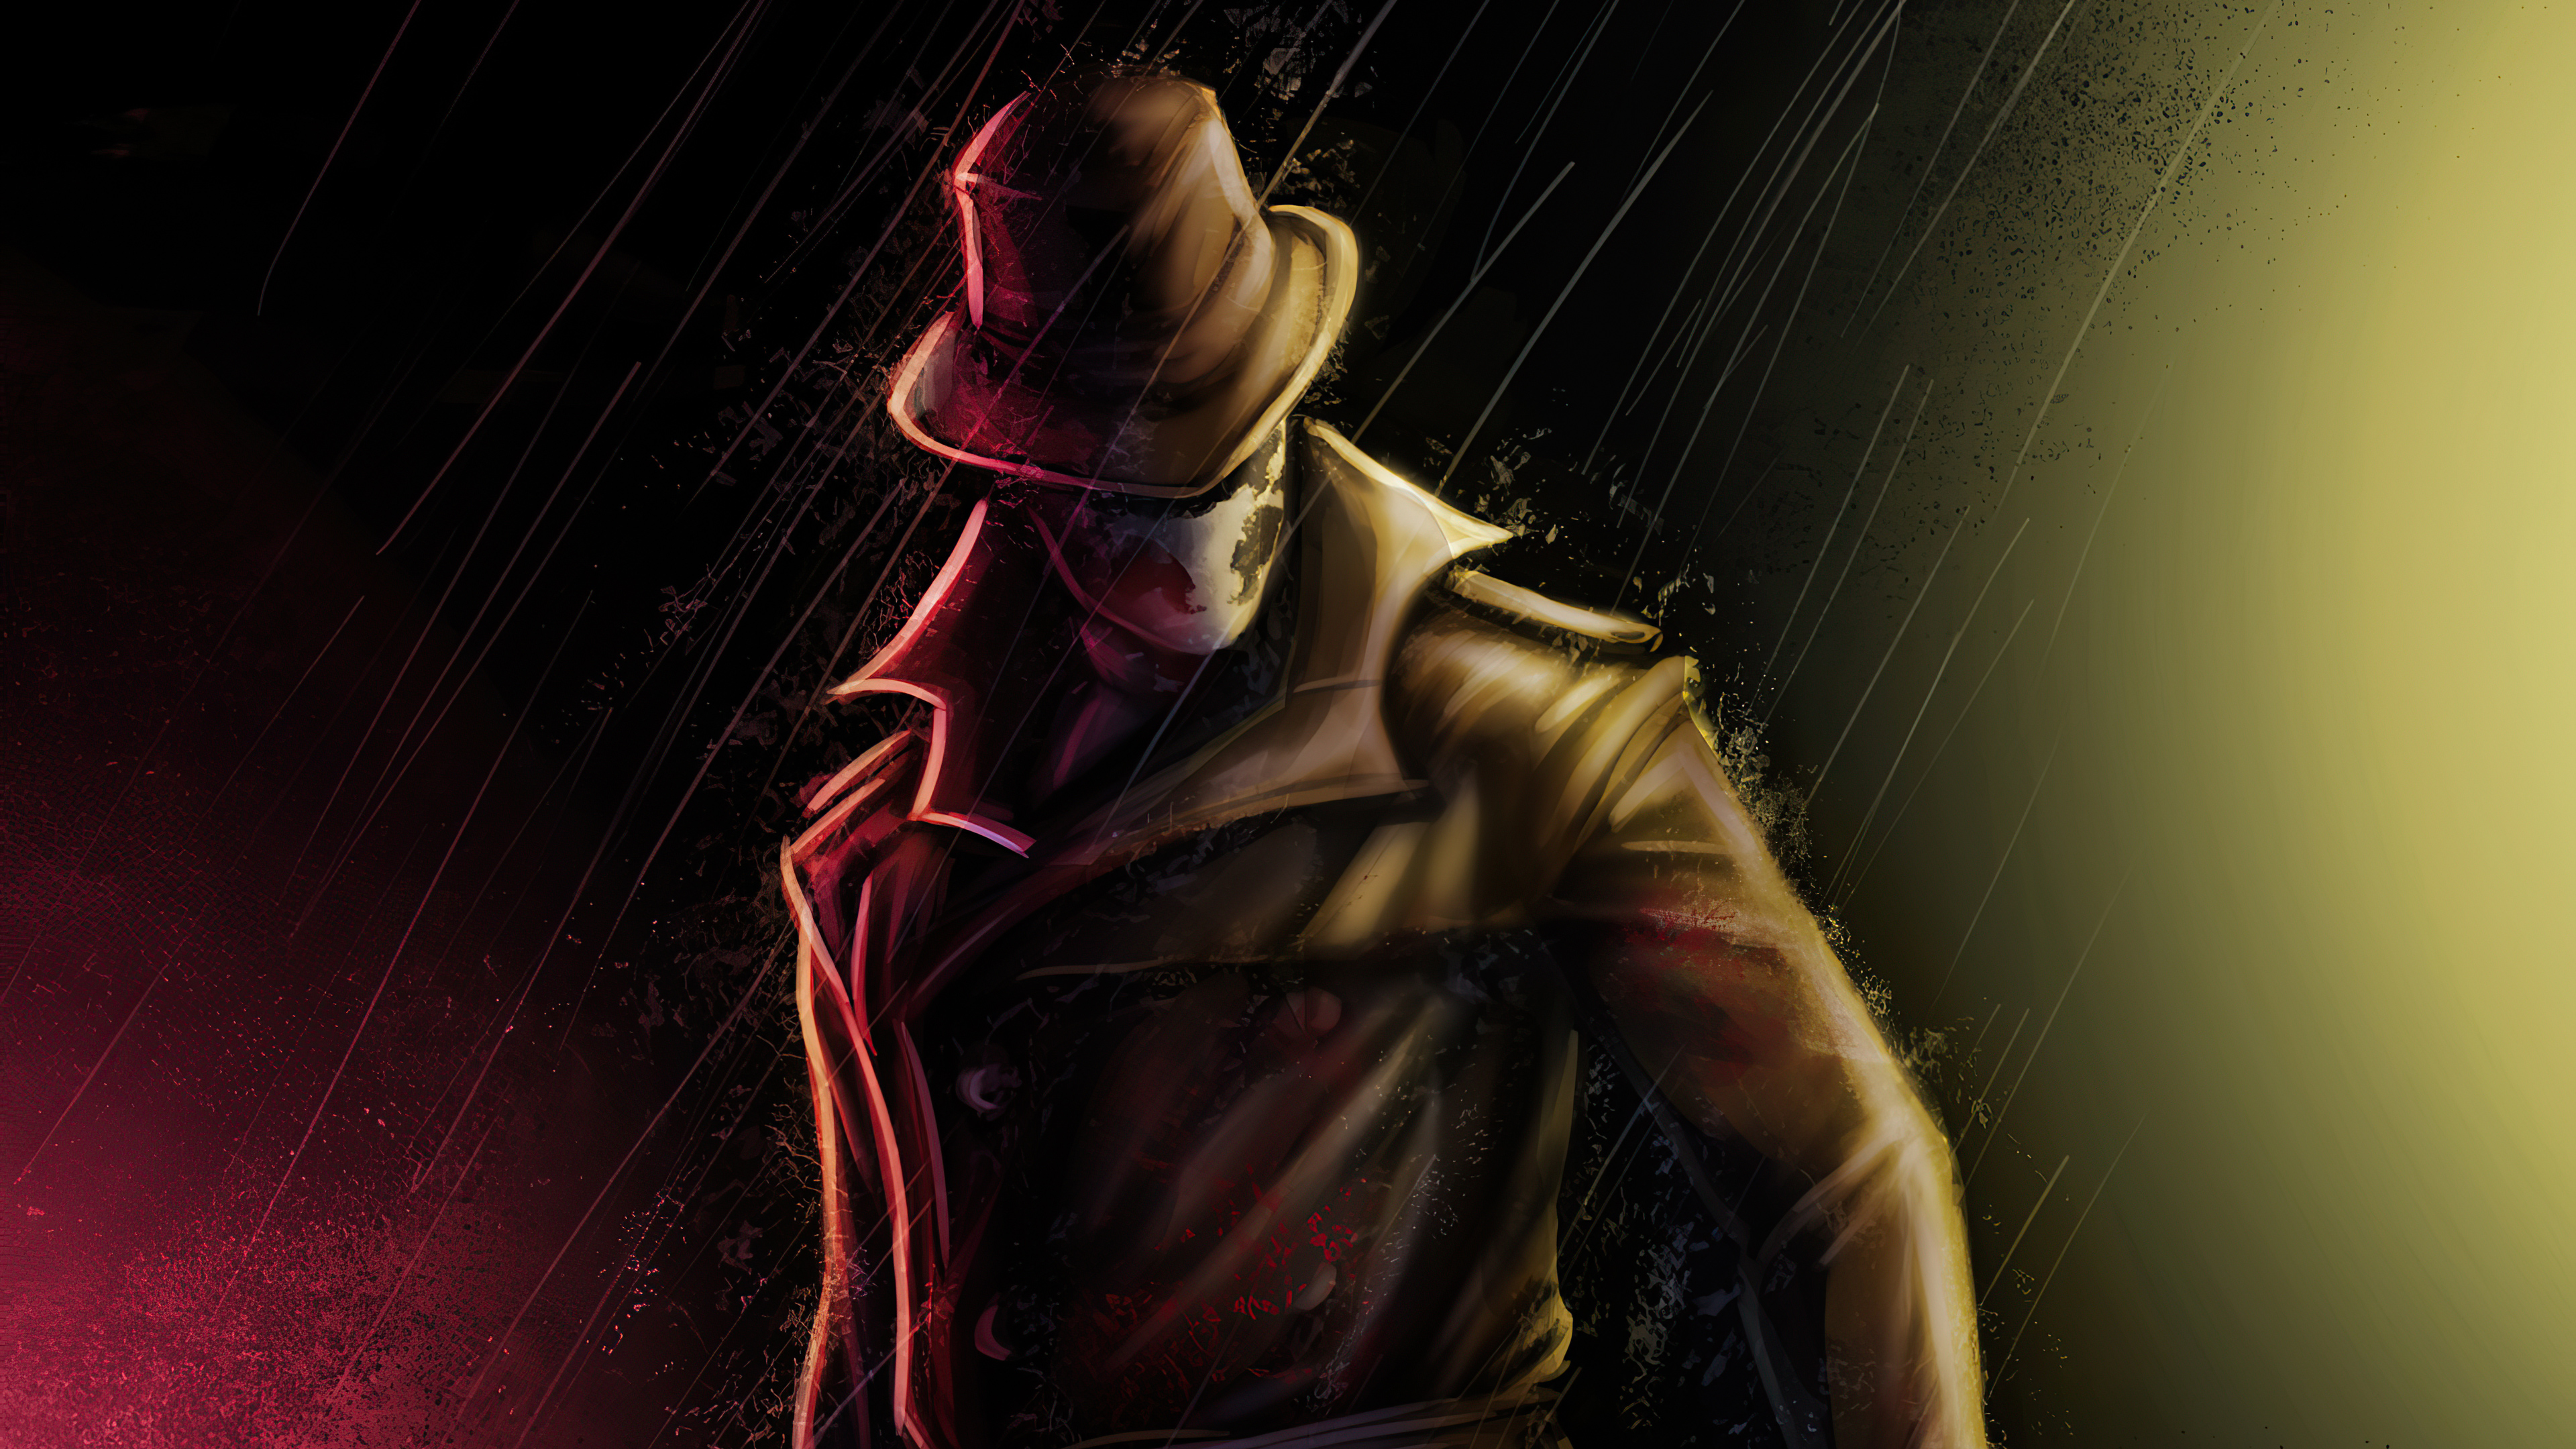 Fondos de pantalla Rorschach personaje de Watchmen